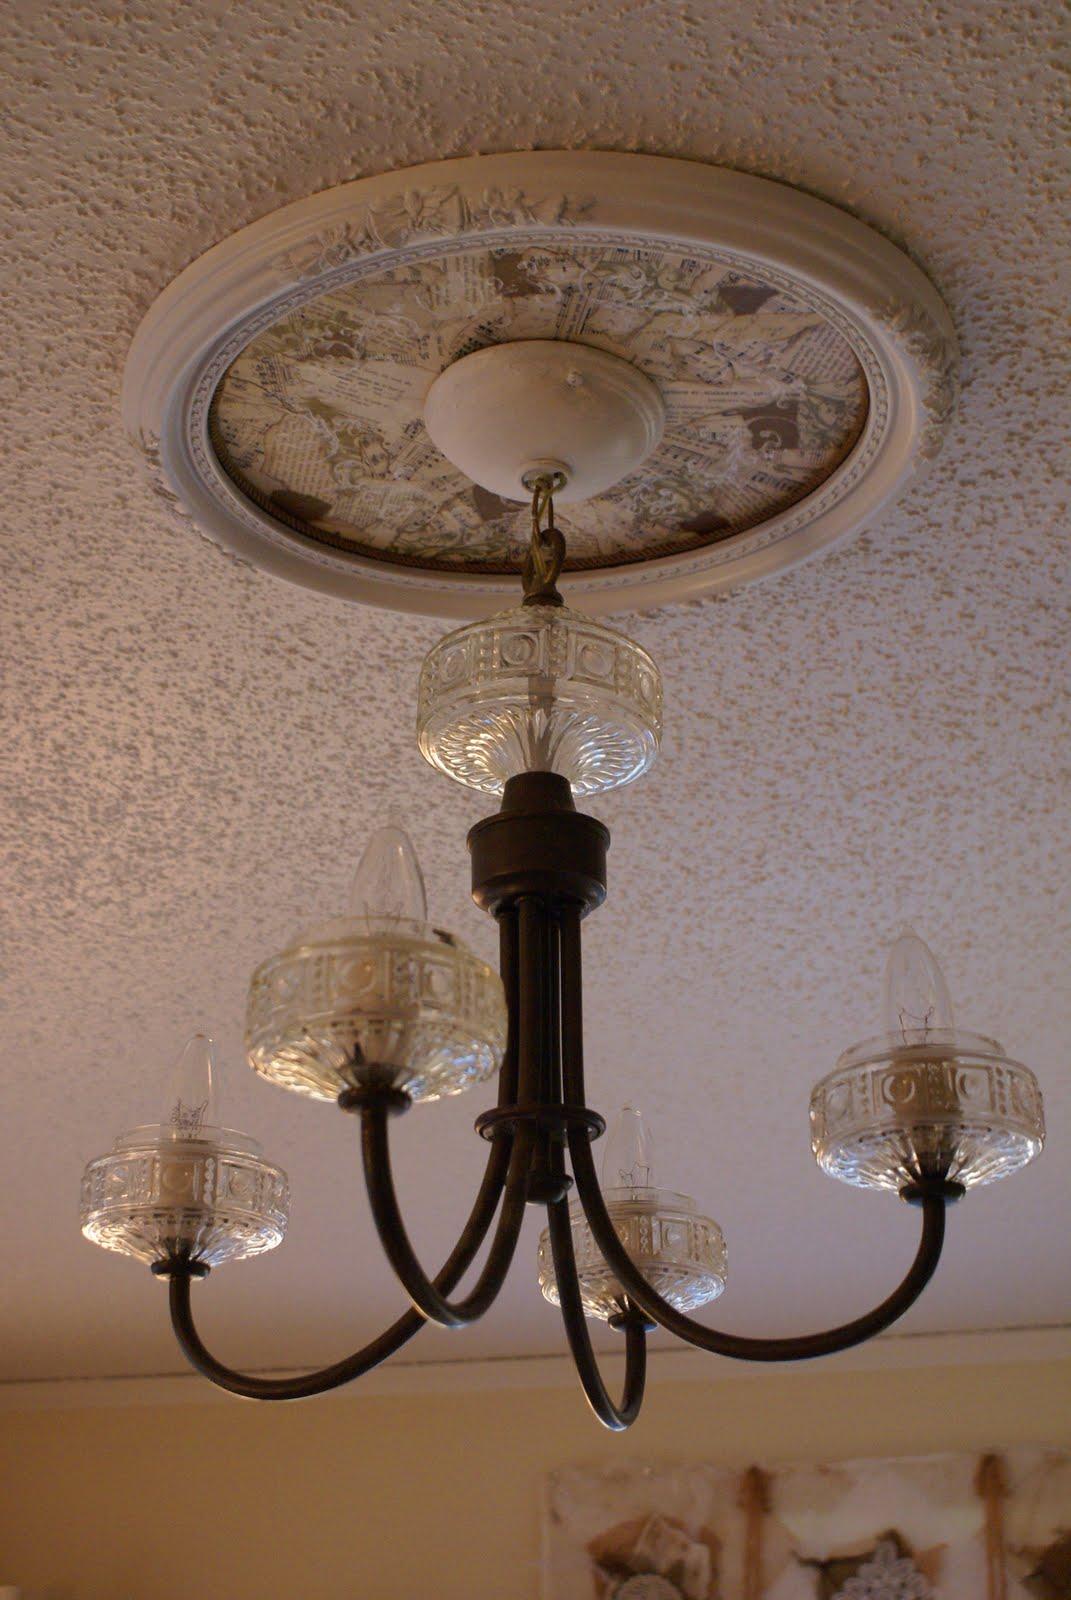 Bronze Ceiling Fan With Light Kit